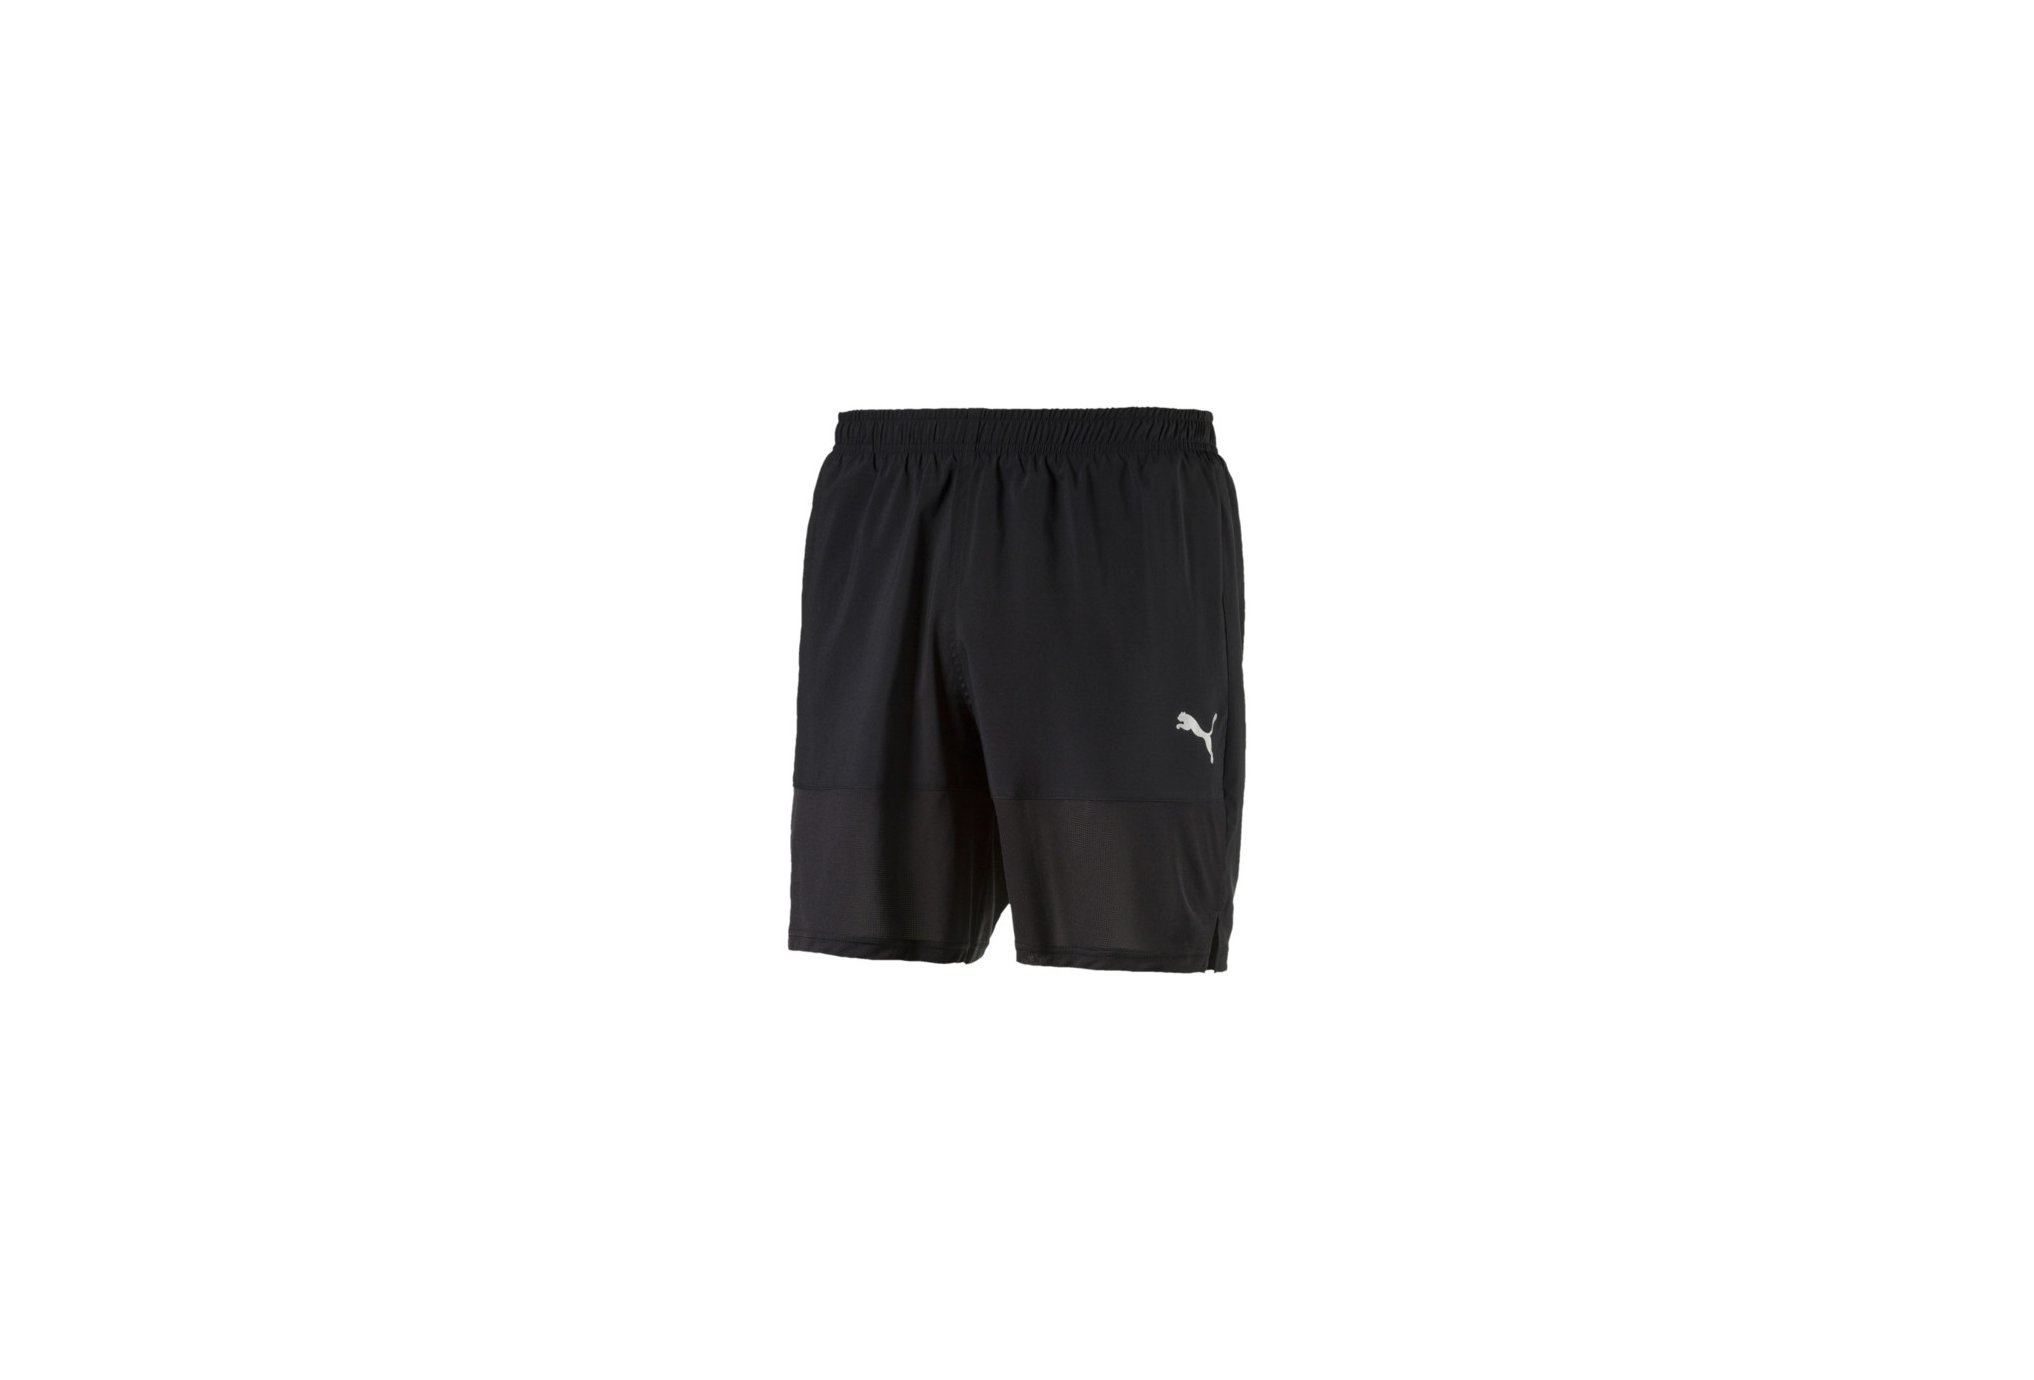 Puma Ignite 7 M vêtement running homme